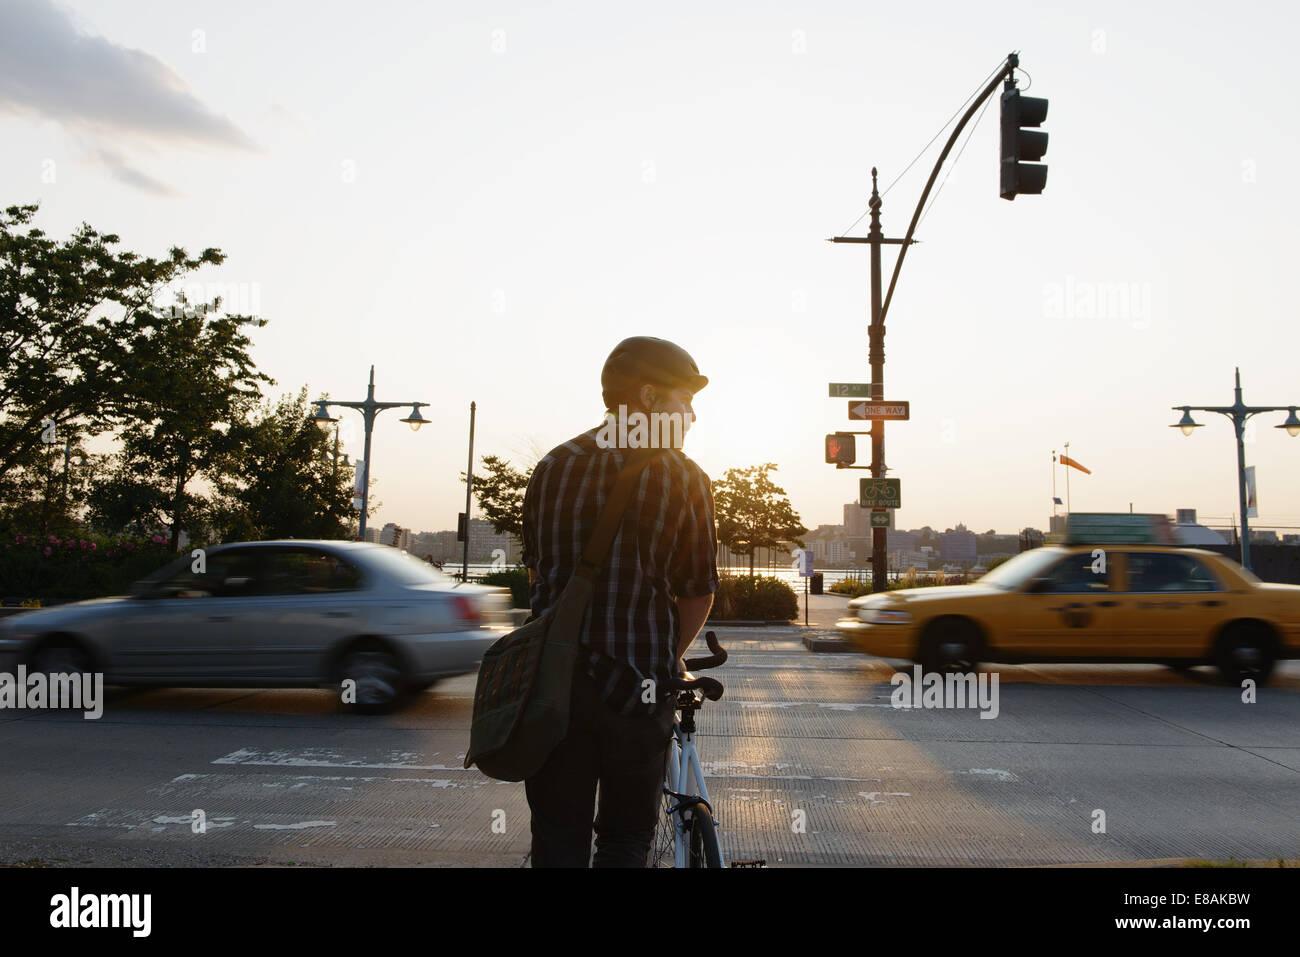 Cycle masculin messenger en attente de la rue animée Photo Stock